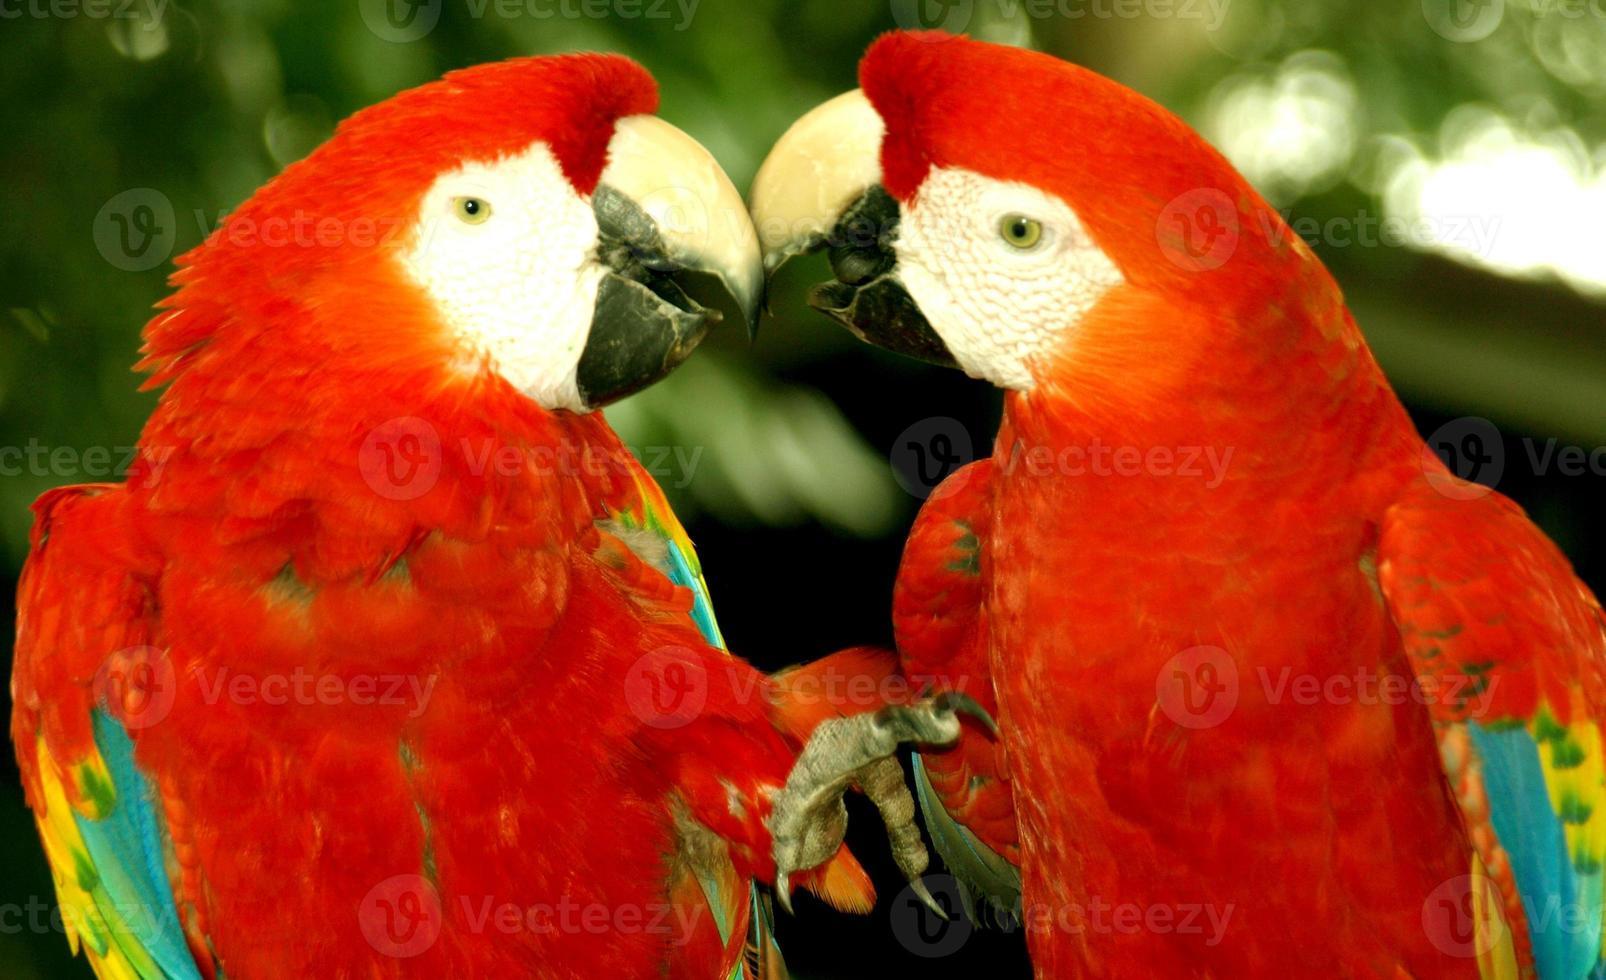 baciare i pappagalli foto